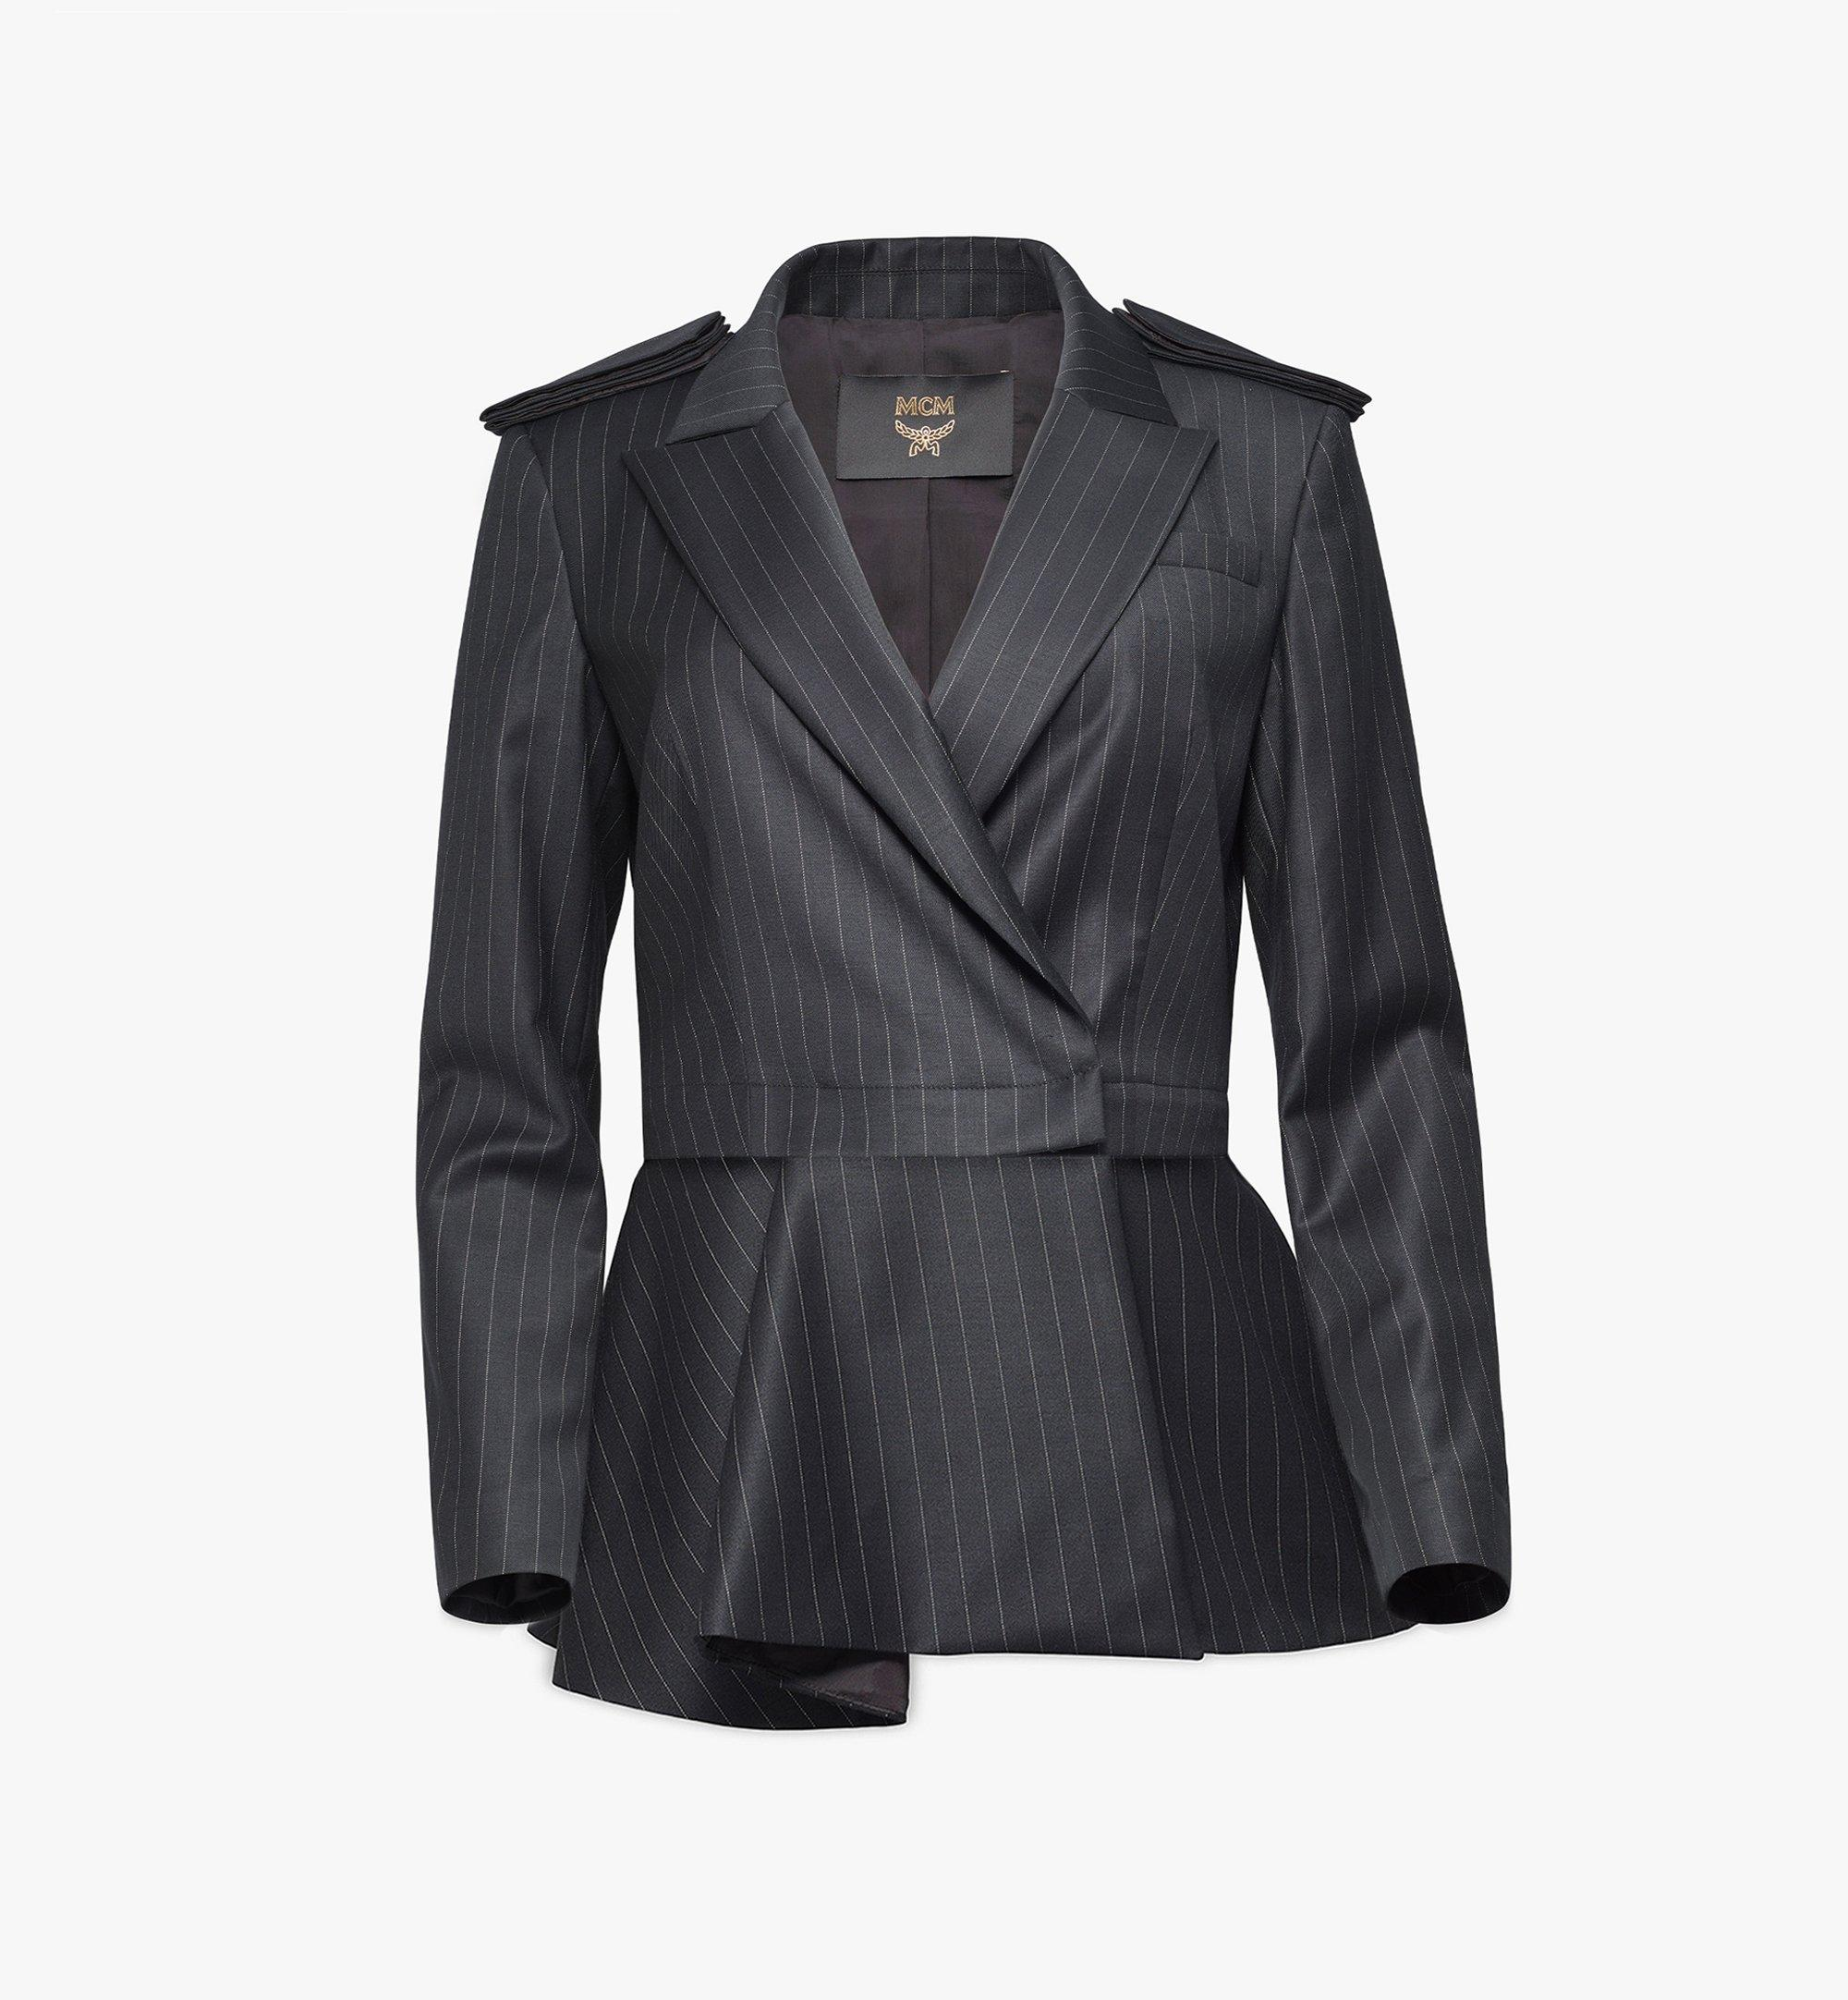 MCM Women's Epaulette Wool Blazer Black MFJBSMM02B2038 Alternate View 1